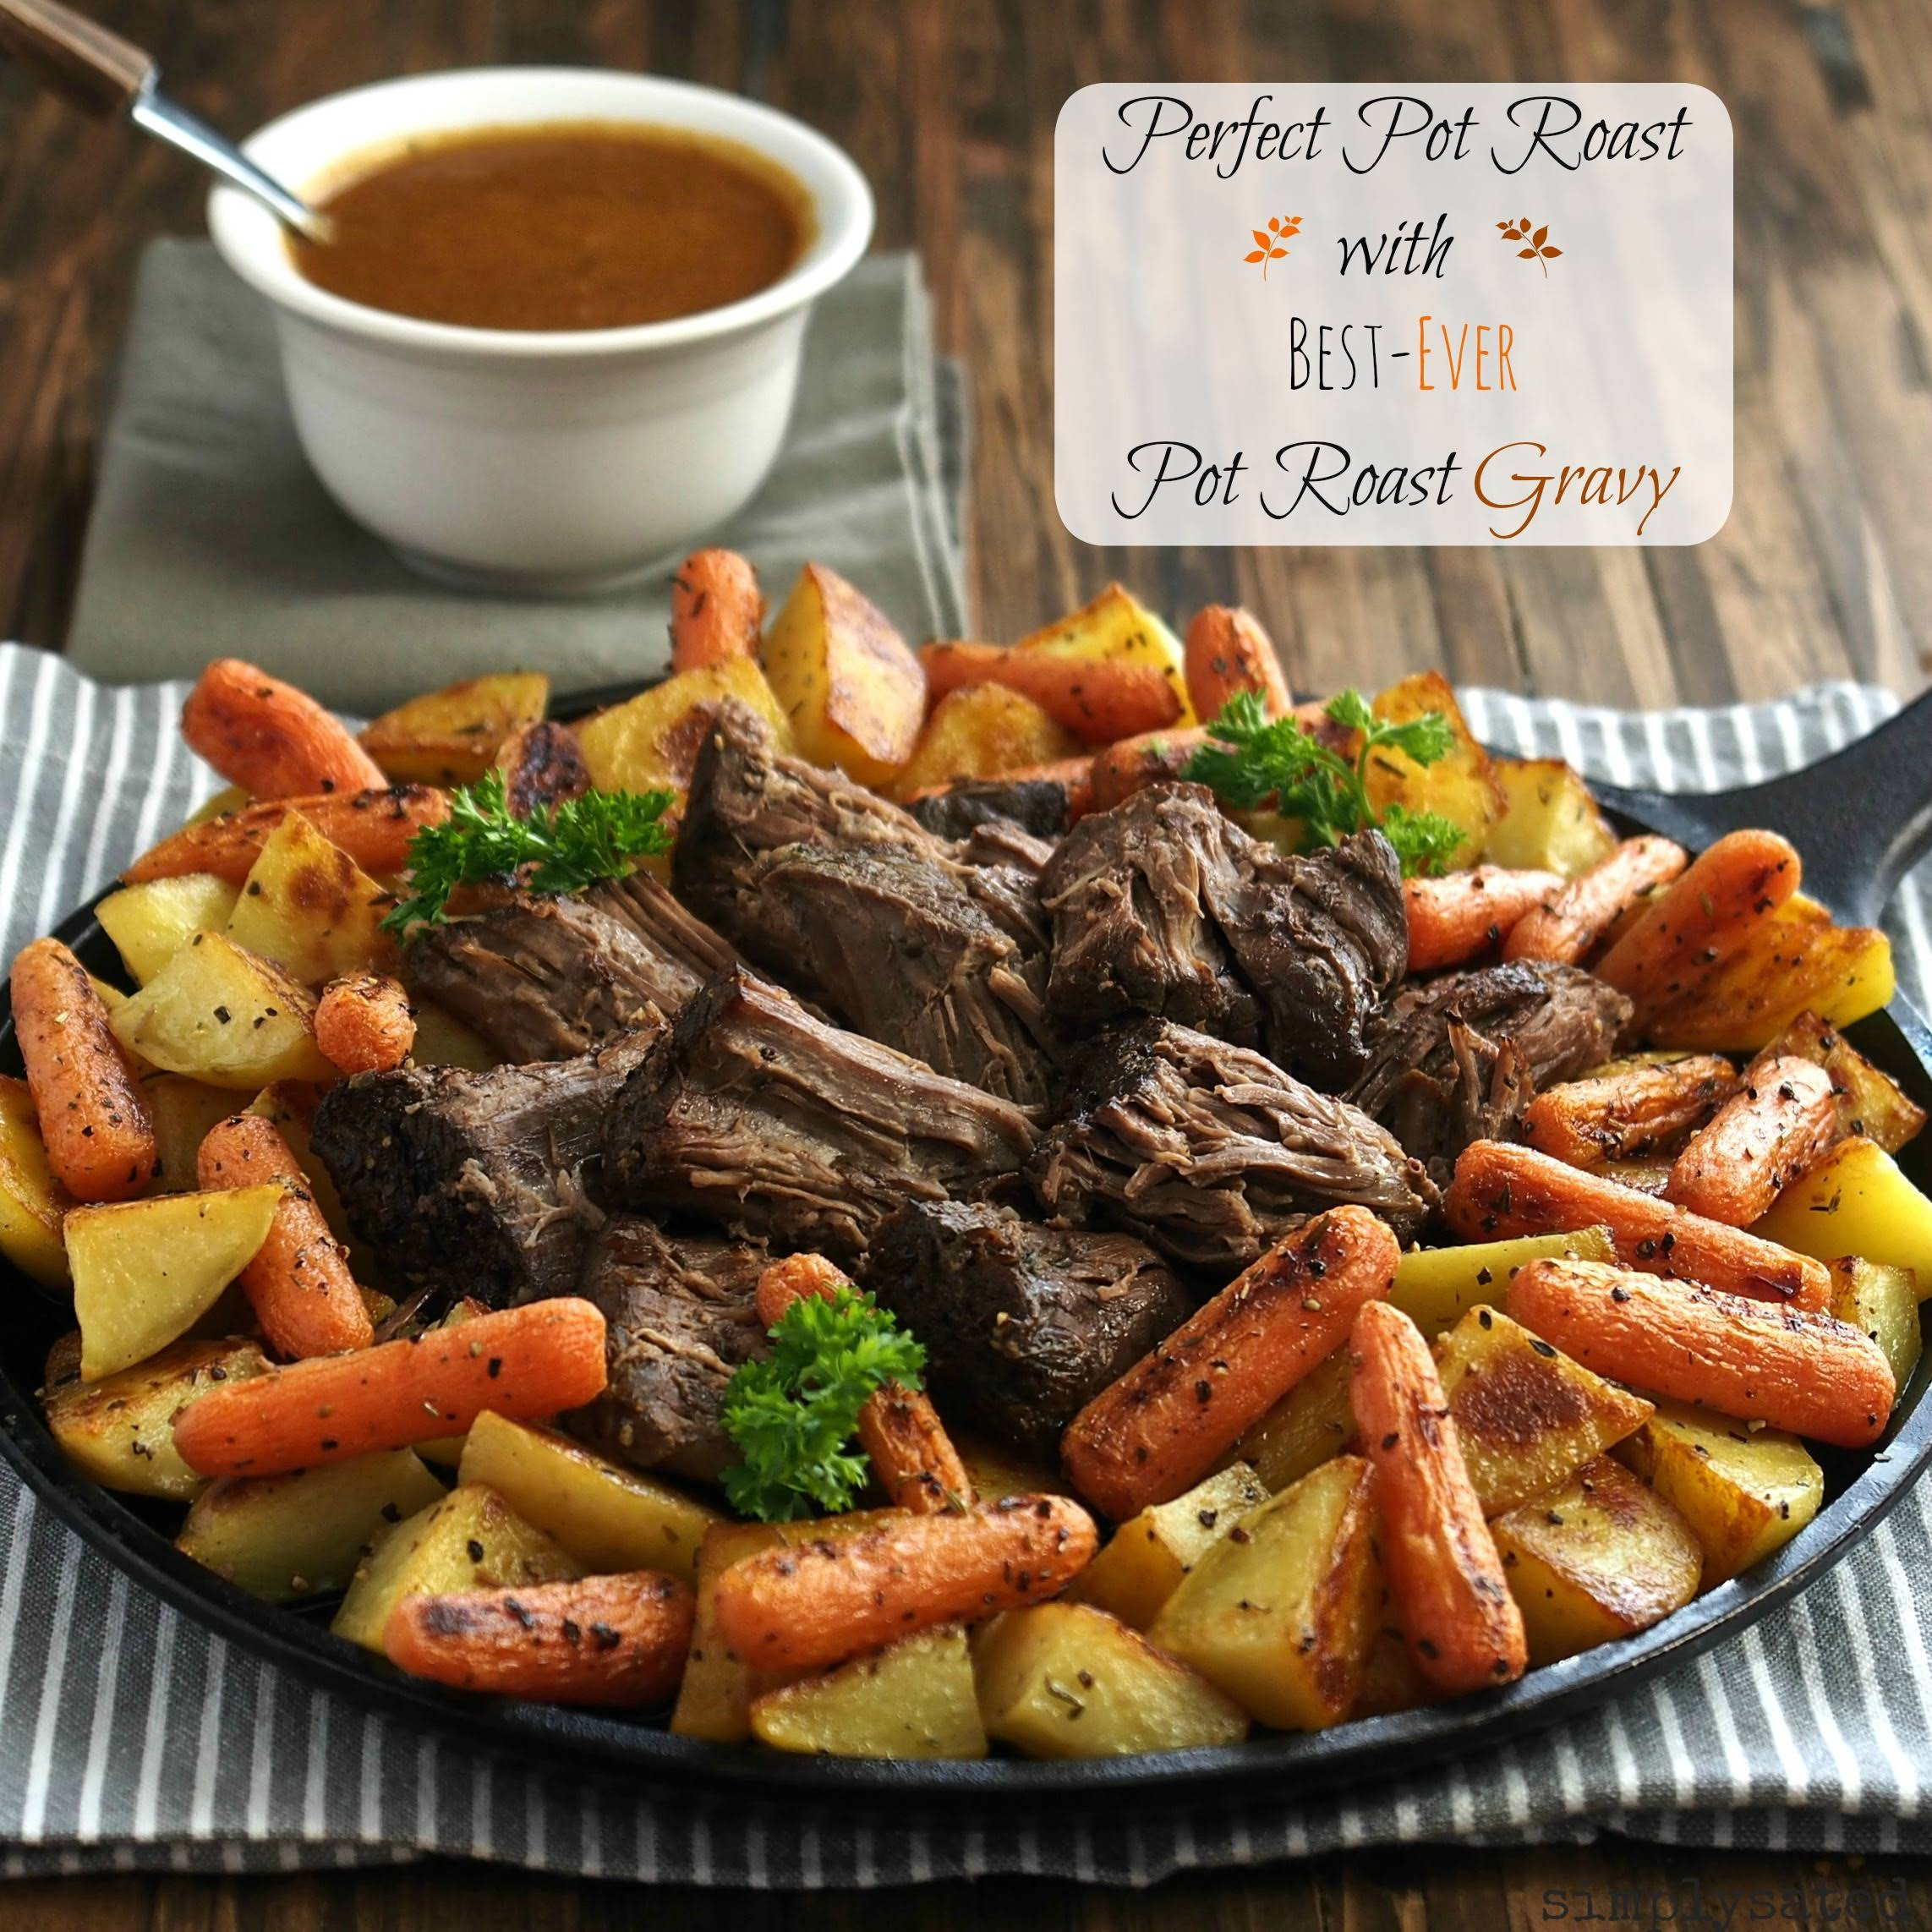 Perfect Pot Roast  next Best Ever Pot Roast Gravy